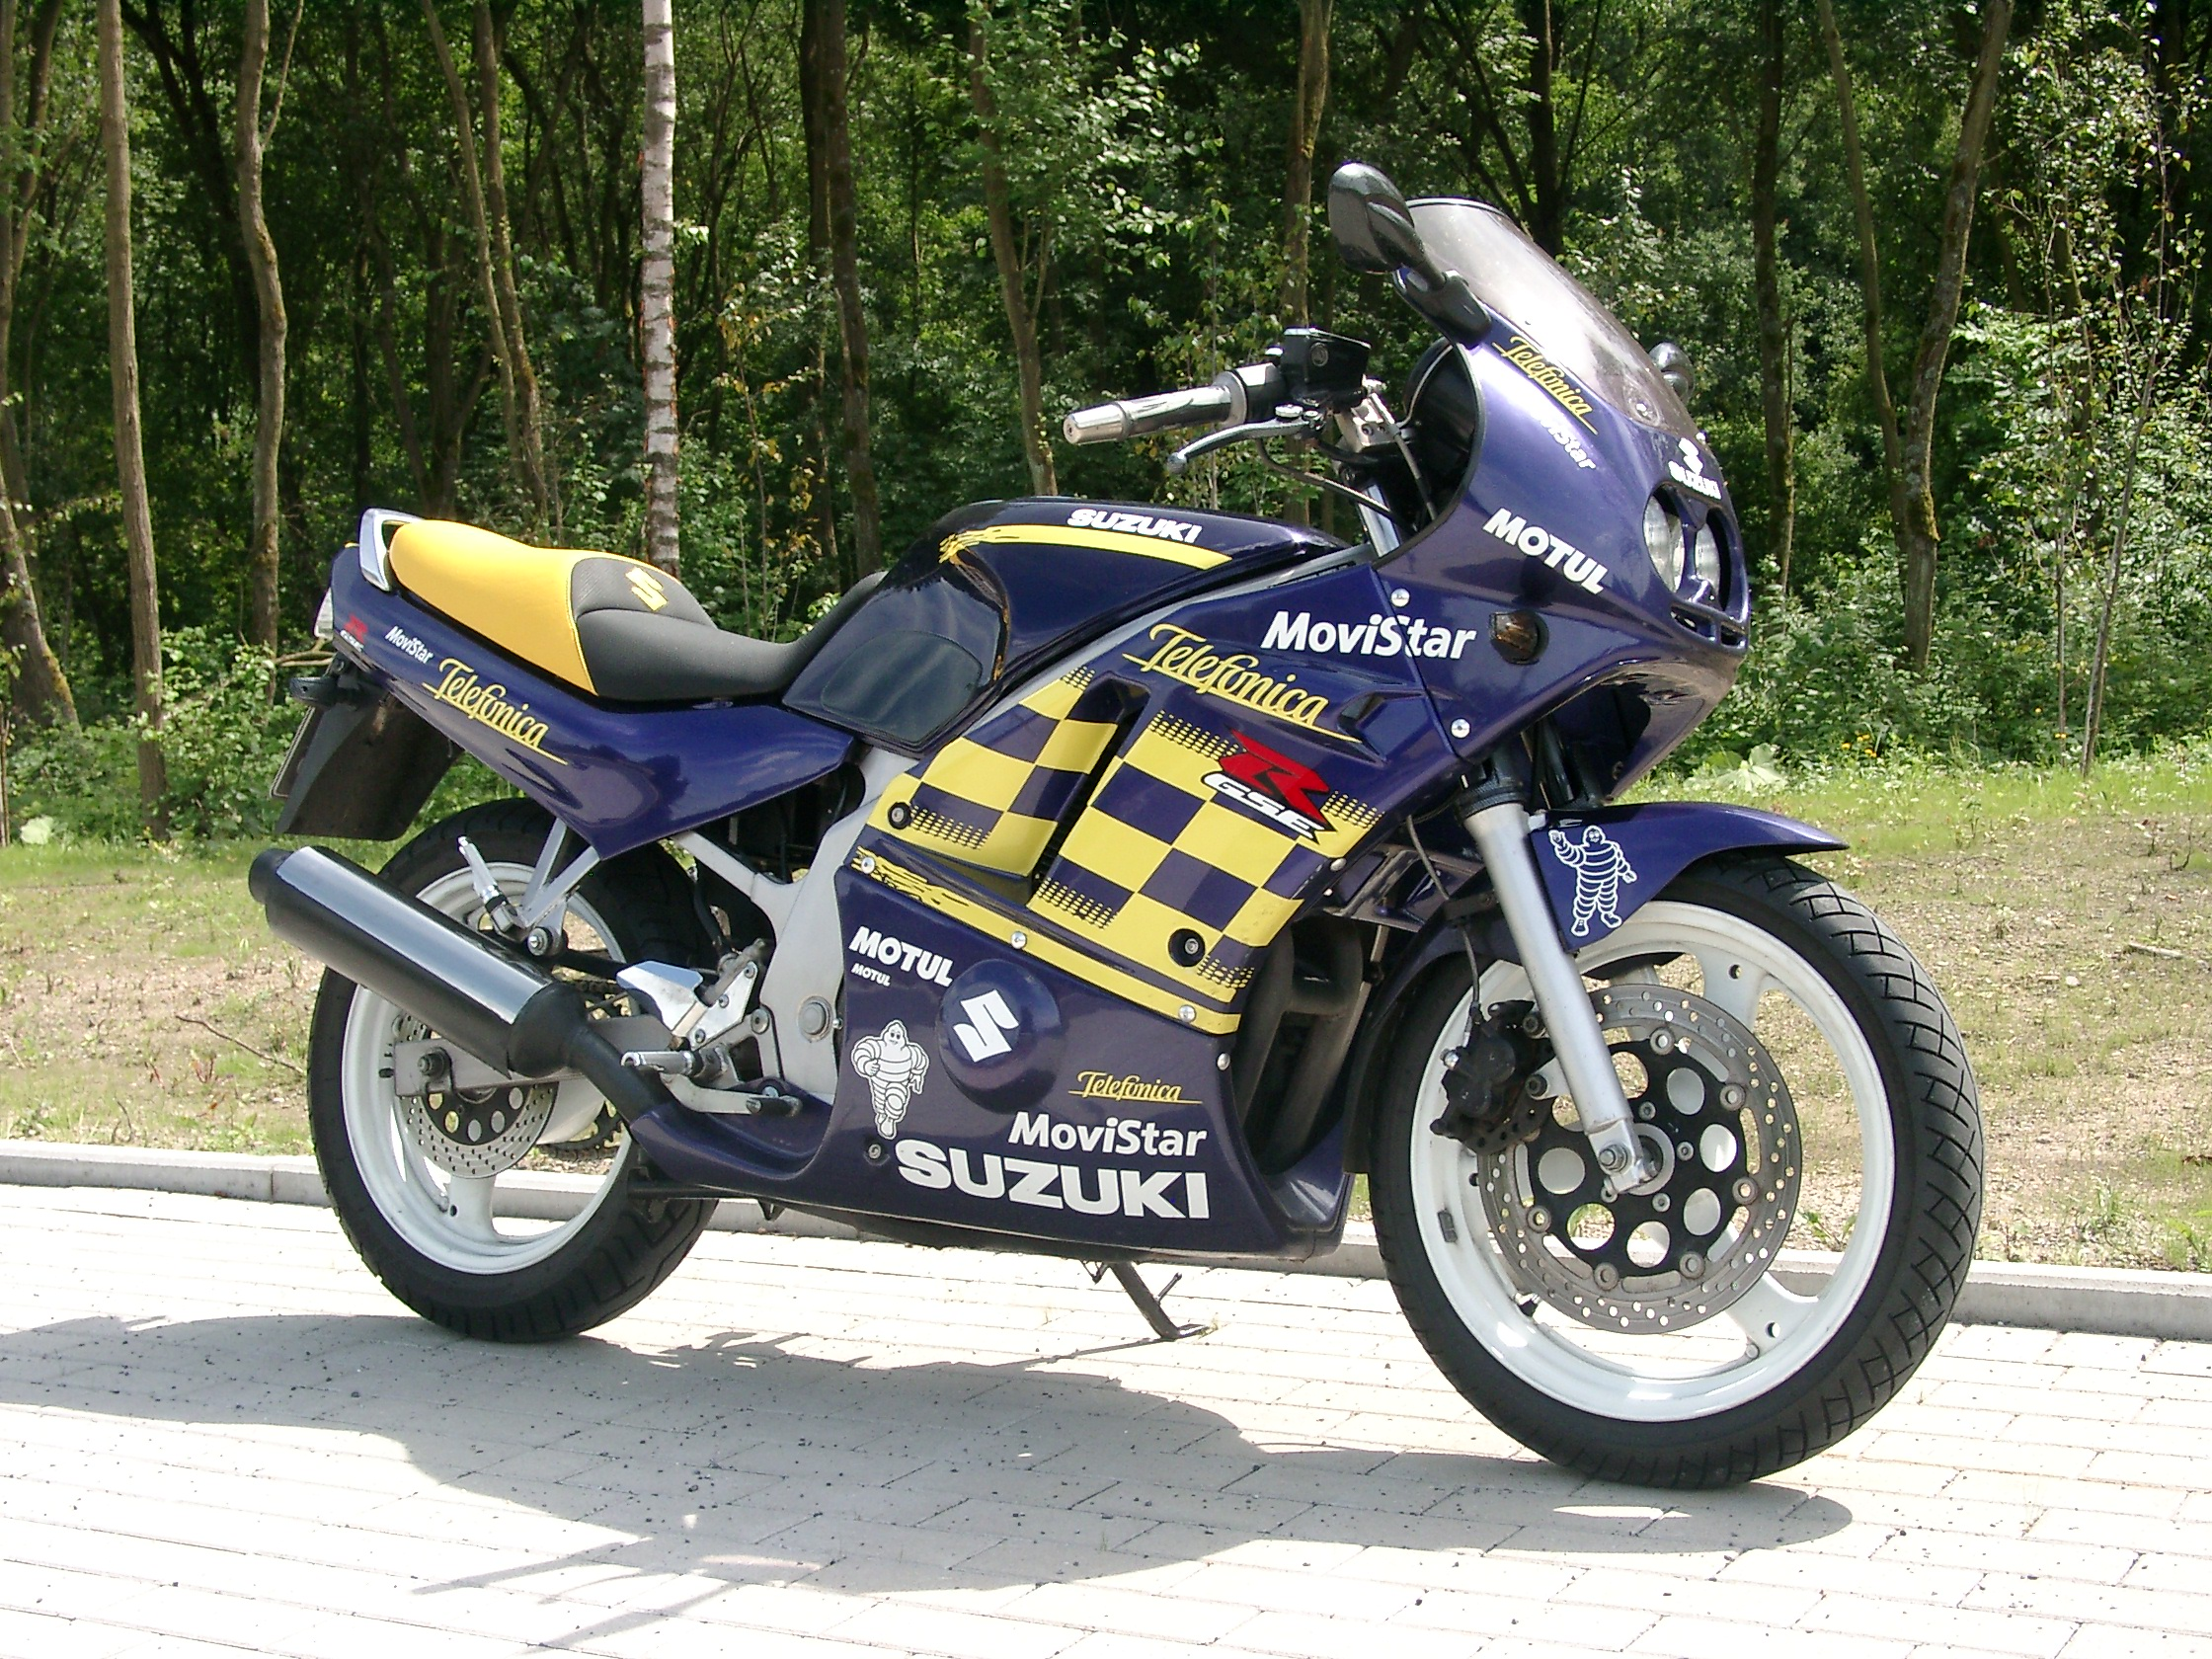 File:Suzuki GS 500 E-1993.JPG - Wikimedia Commons